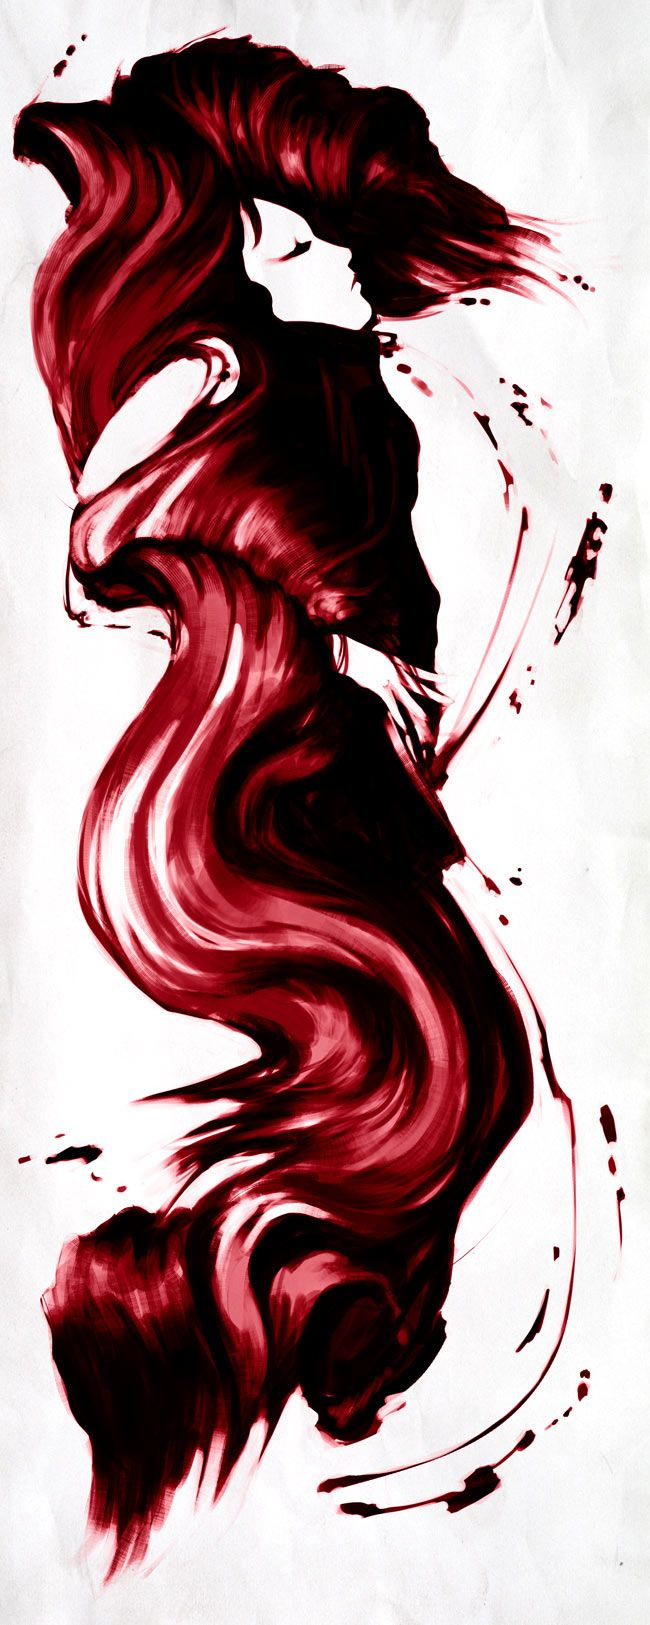 Hair Brush - James Nares